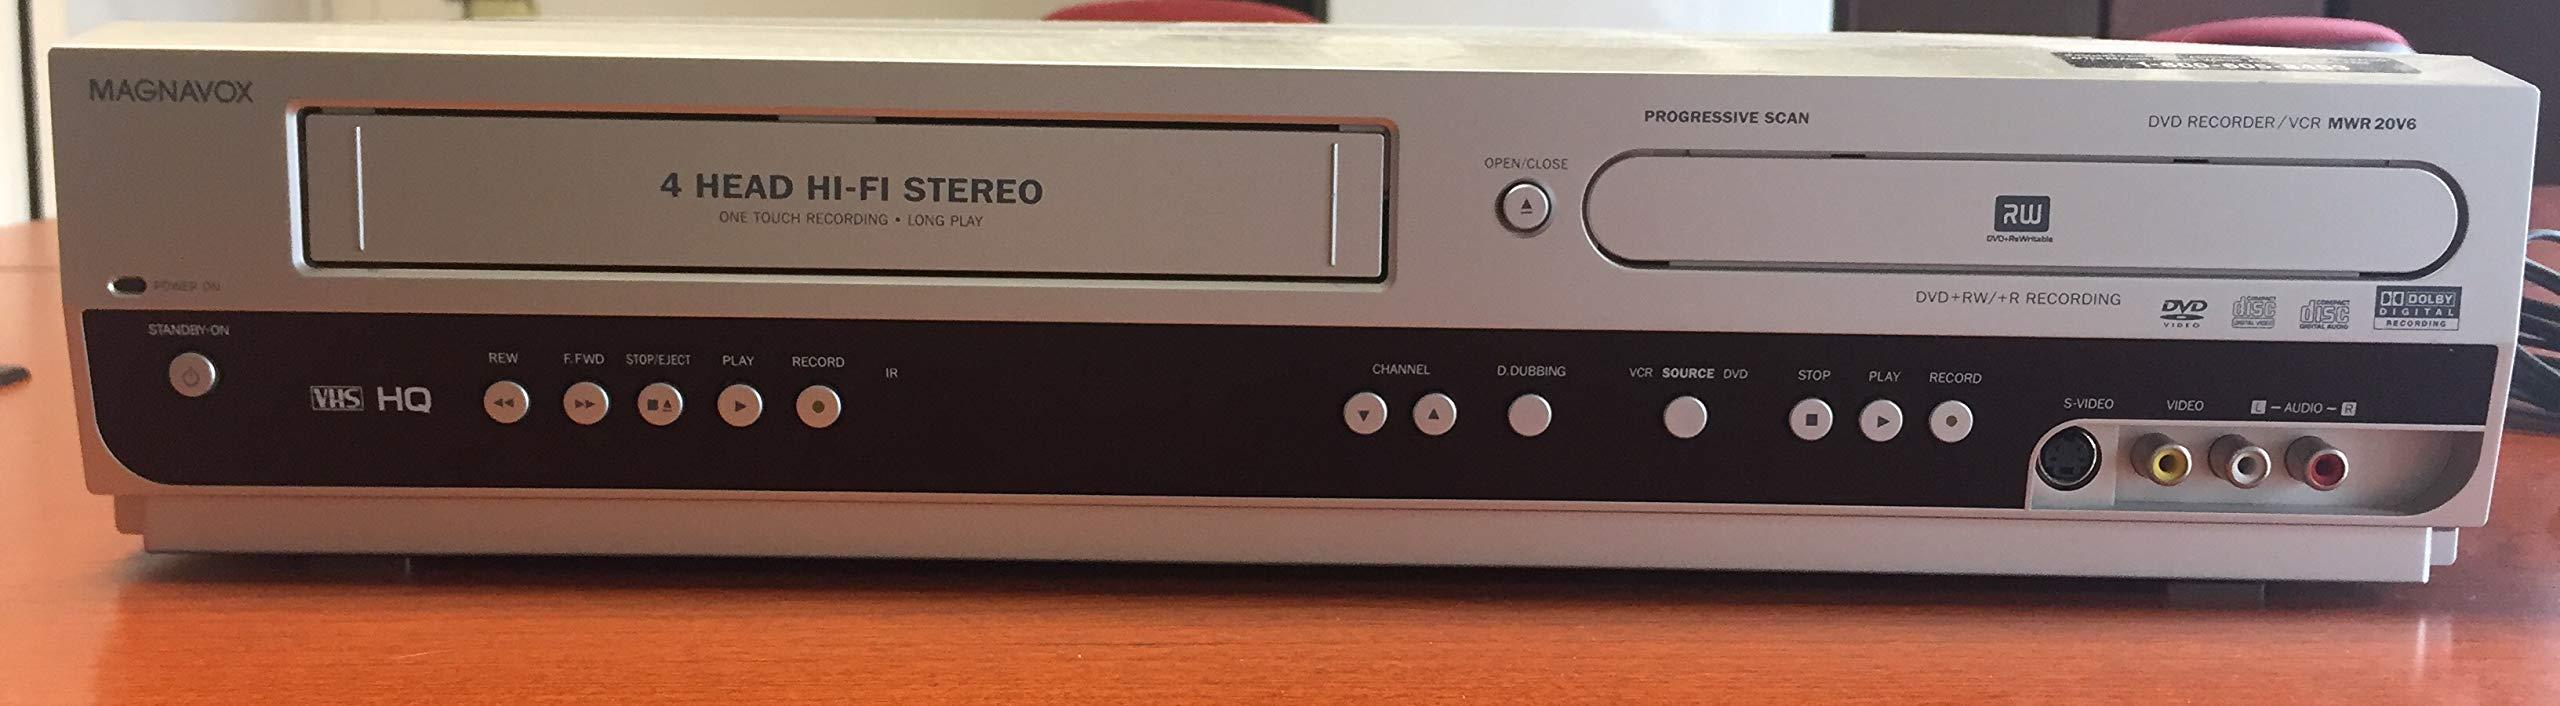 Magnavox MWR20V6 DVD Recorder / VCR Combo by Magnavox